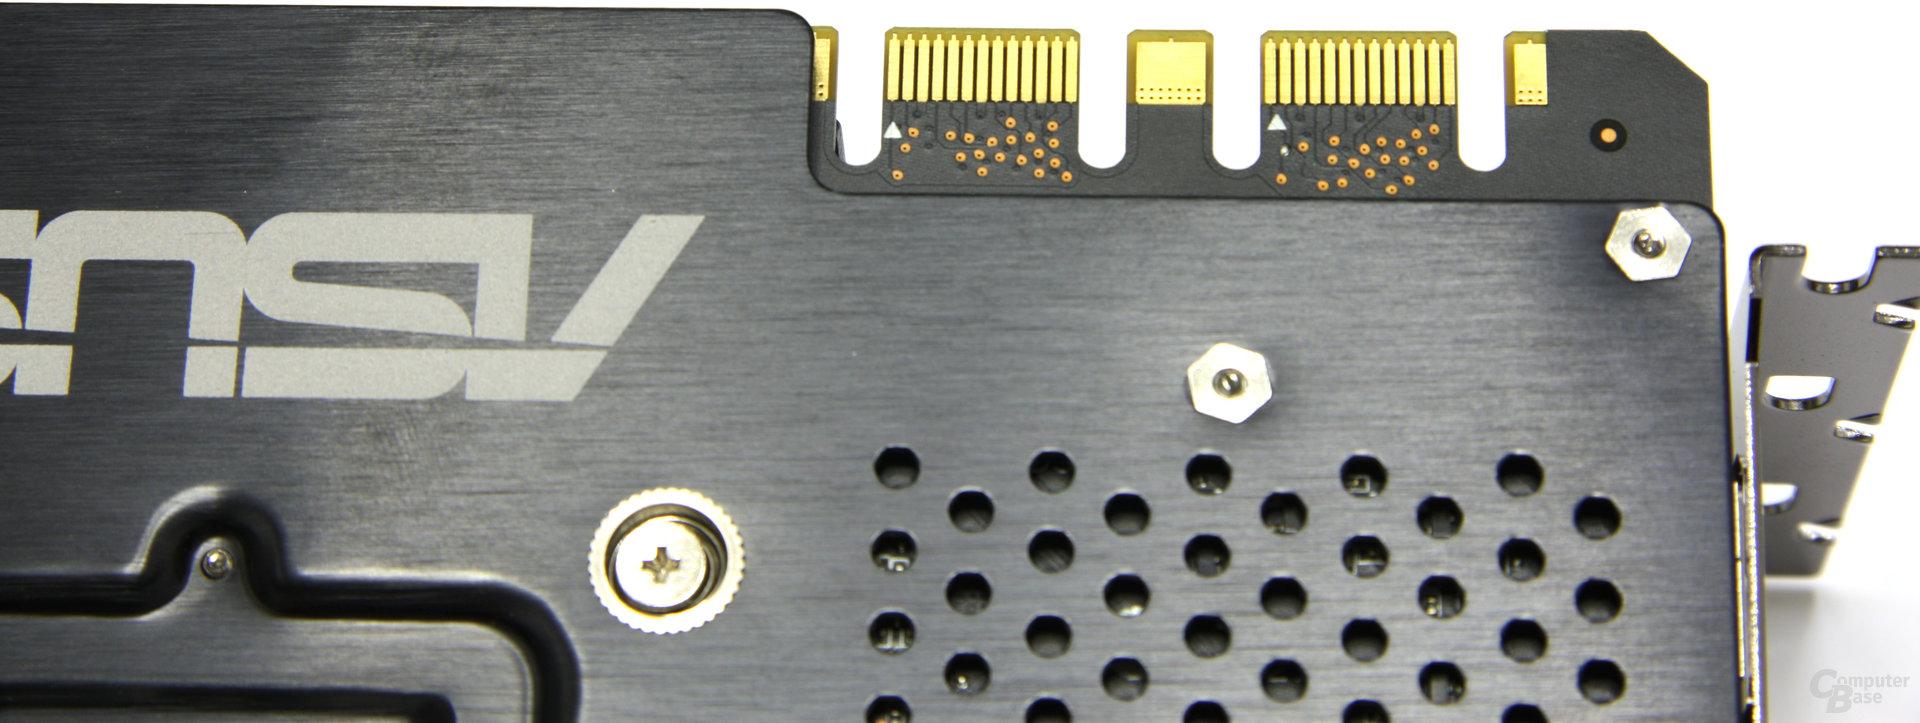 GeForce GTX 570 DirectCU II SLI-Anschlüsse